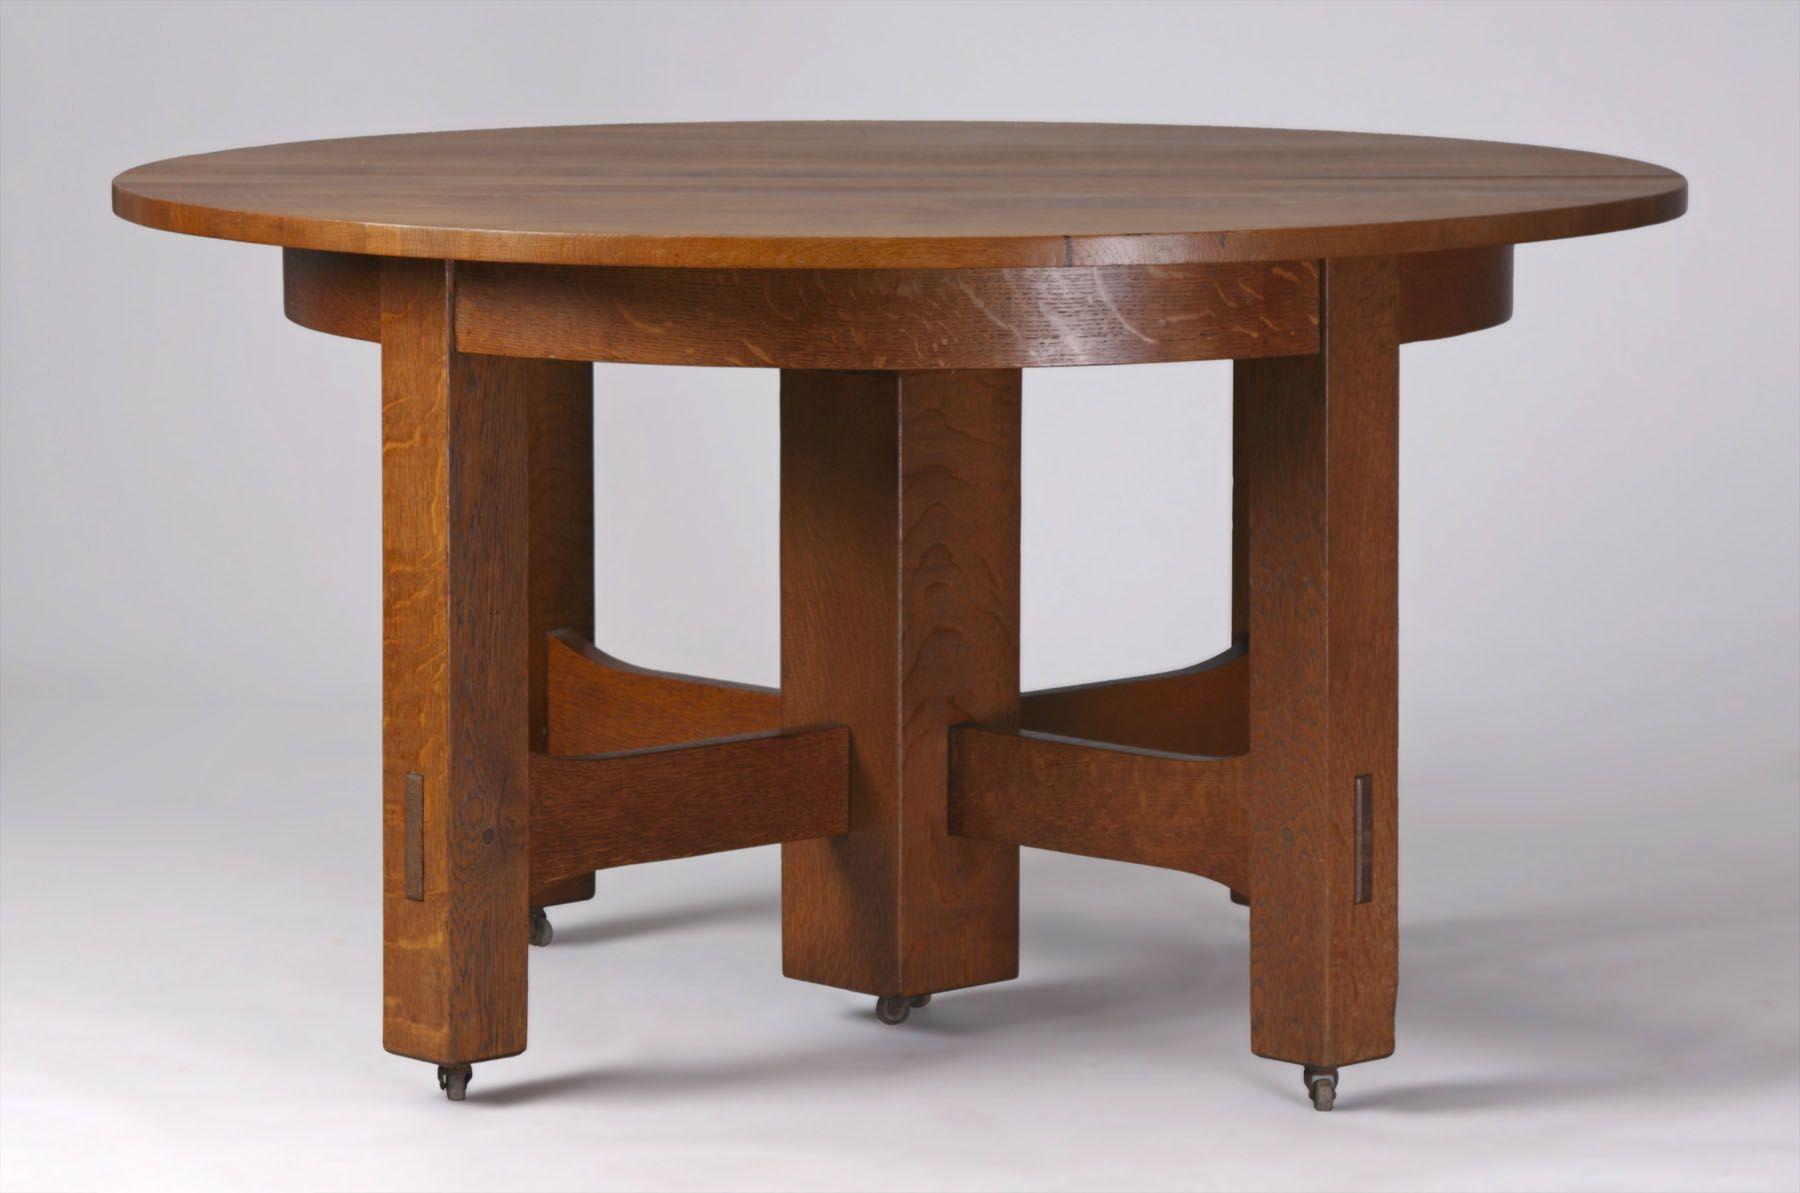 Gustav Stickley Table Stickley Furniture Arts And Crafts